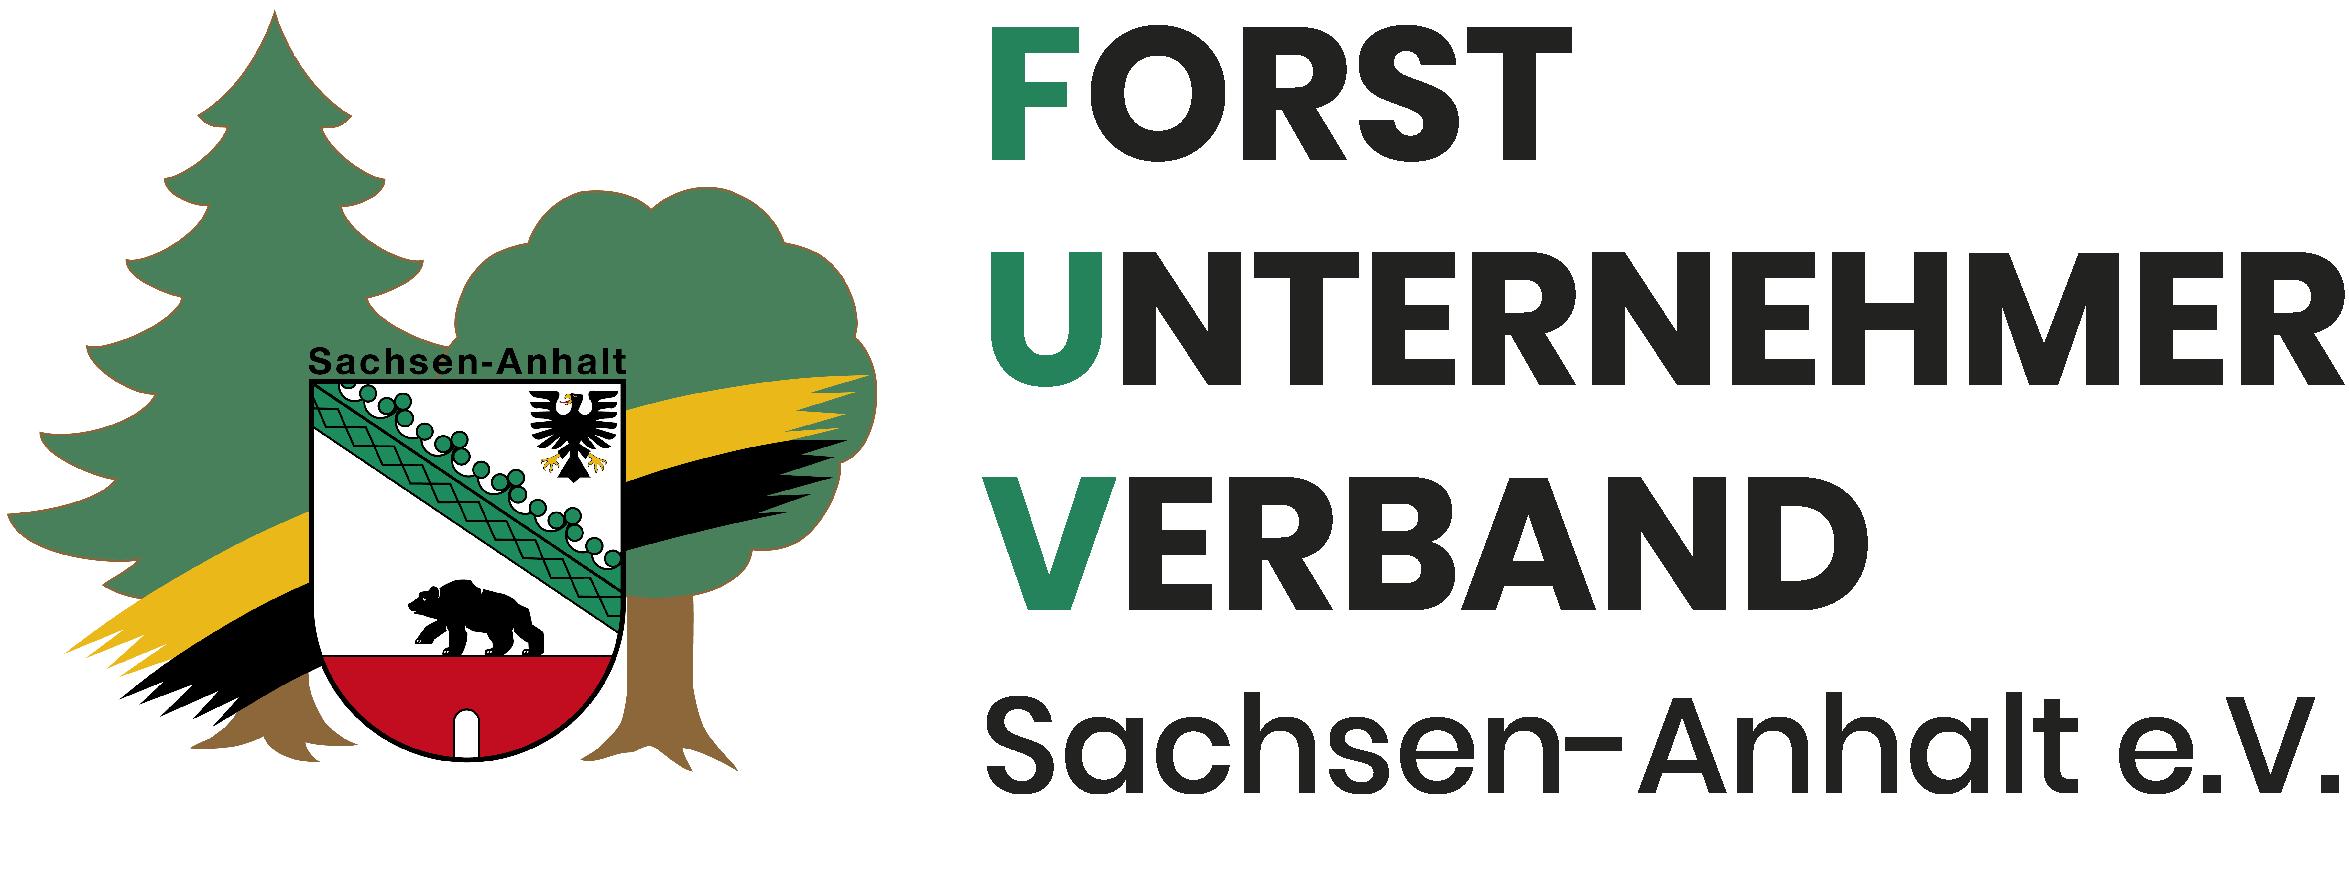 Logo Forst Unternehmer Verband Sachsen-Anhalt e.V. (FUV)